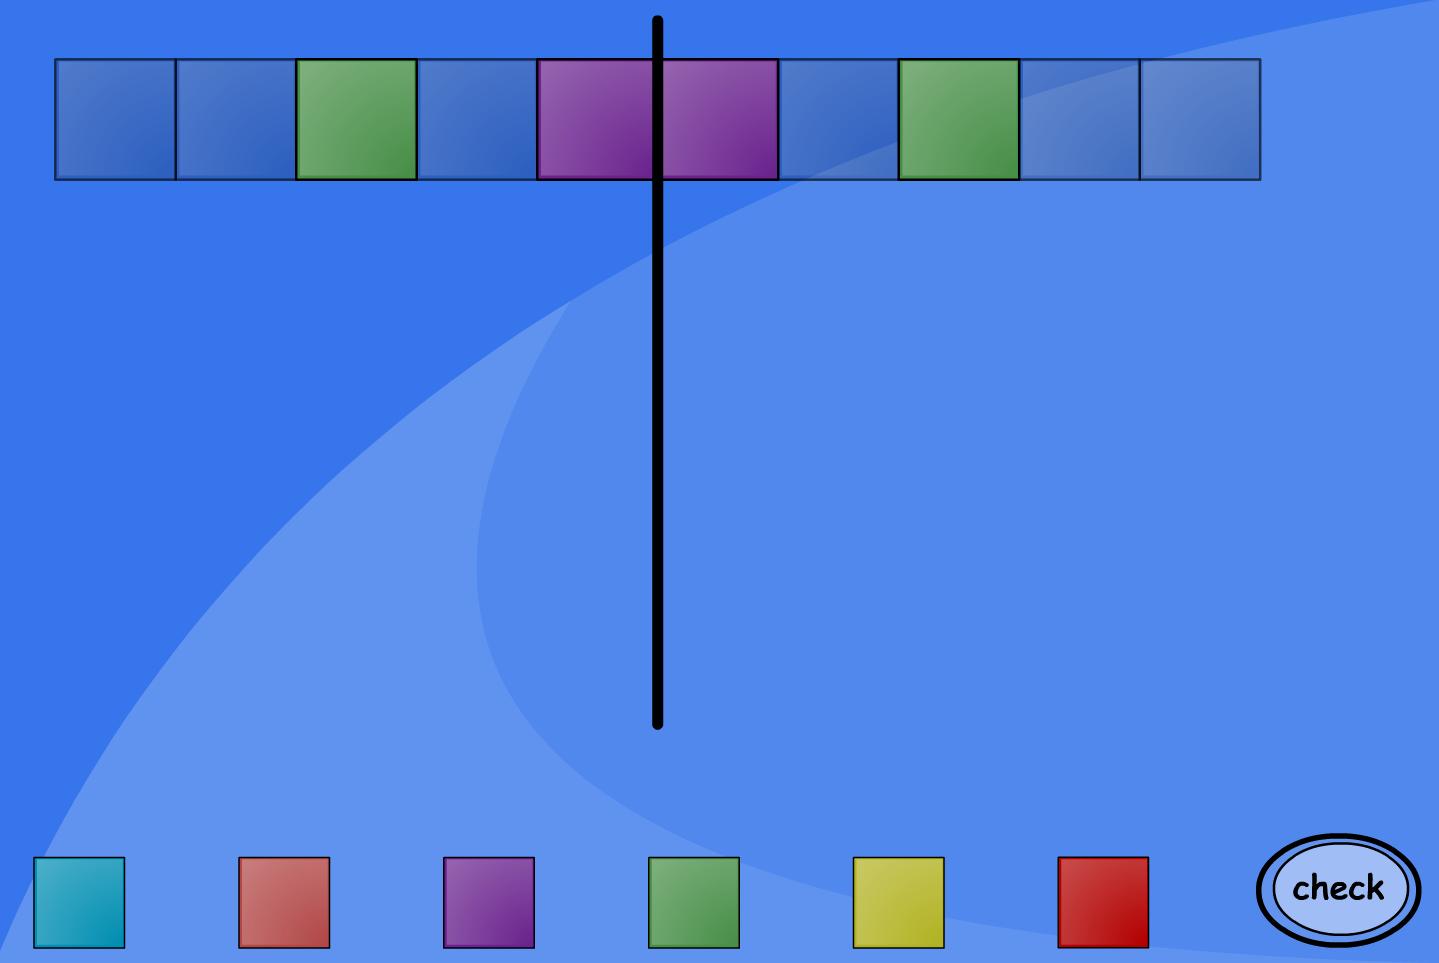 Symmetrical Patterns Interactive Activity - Number KS1